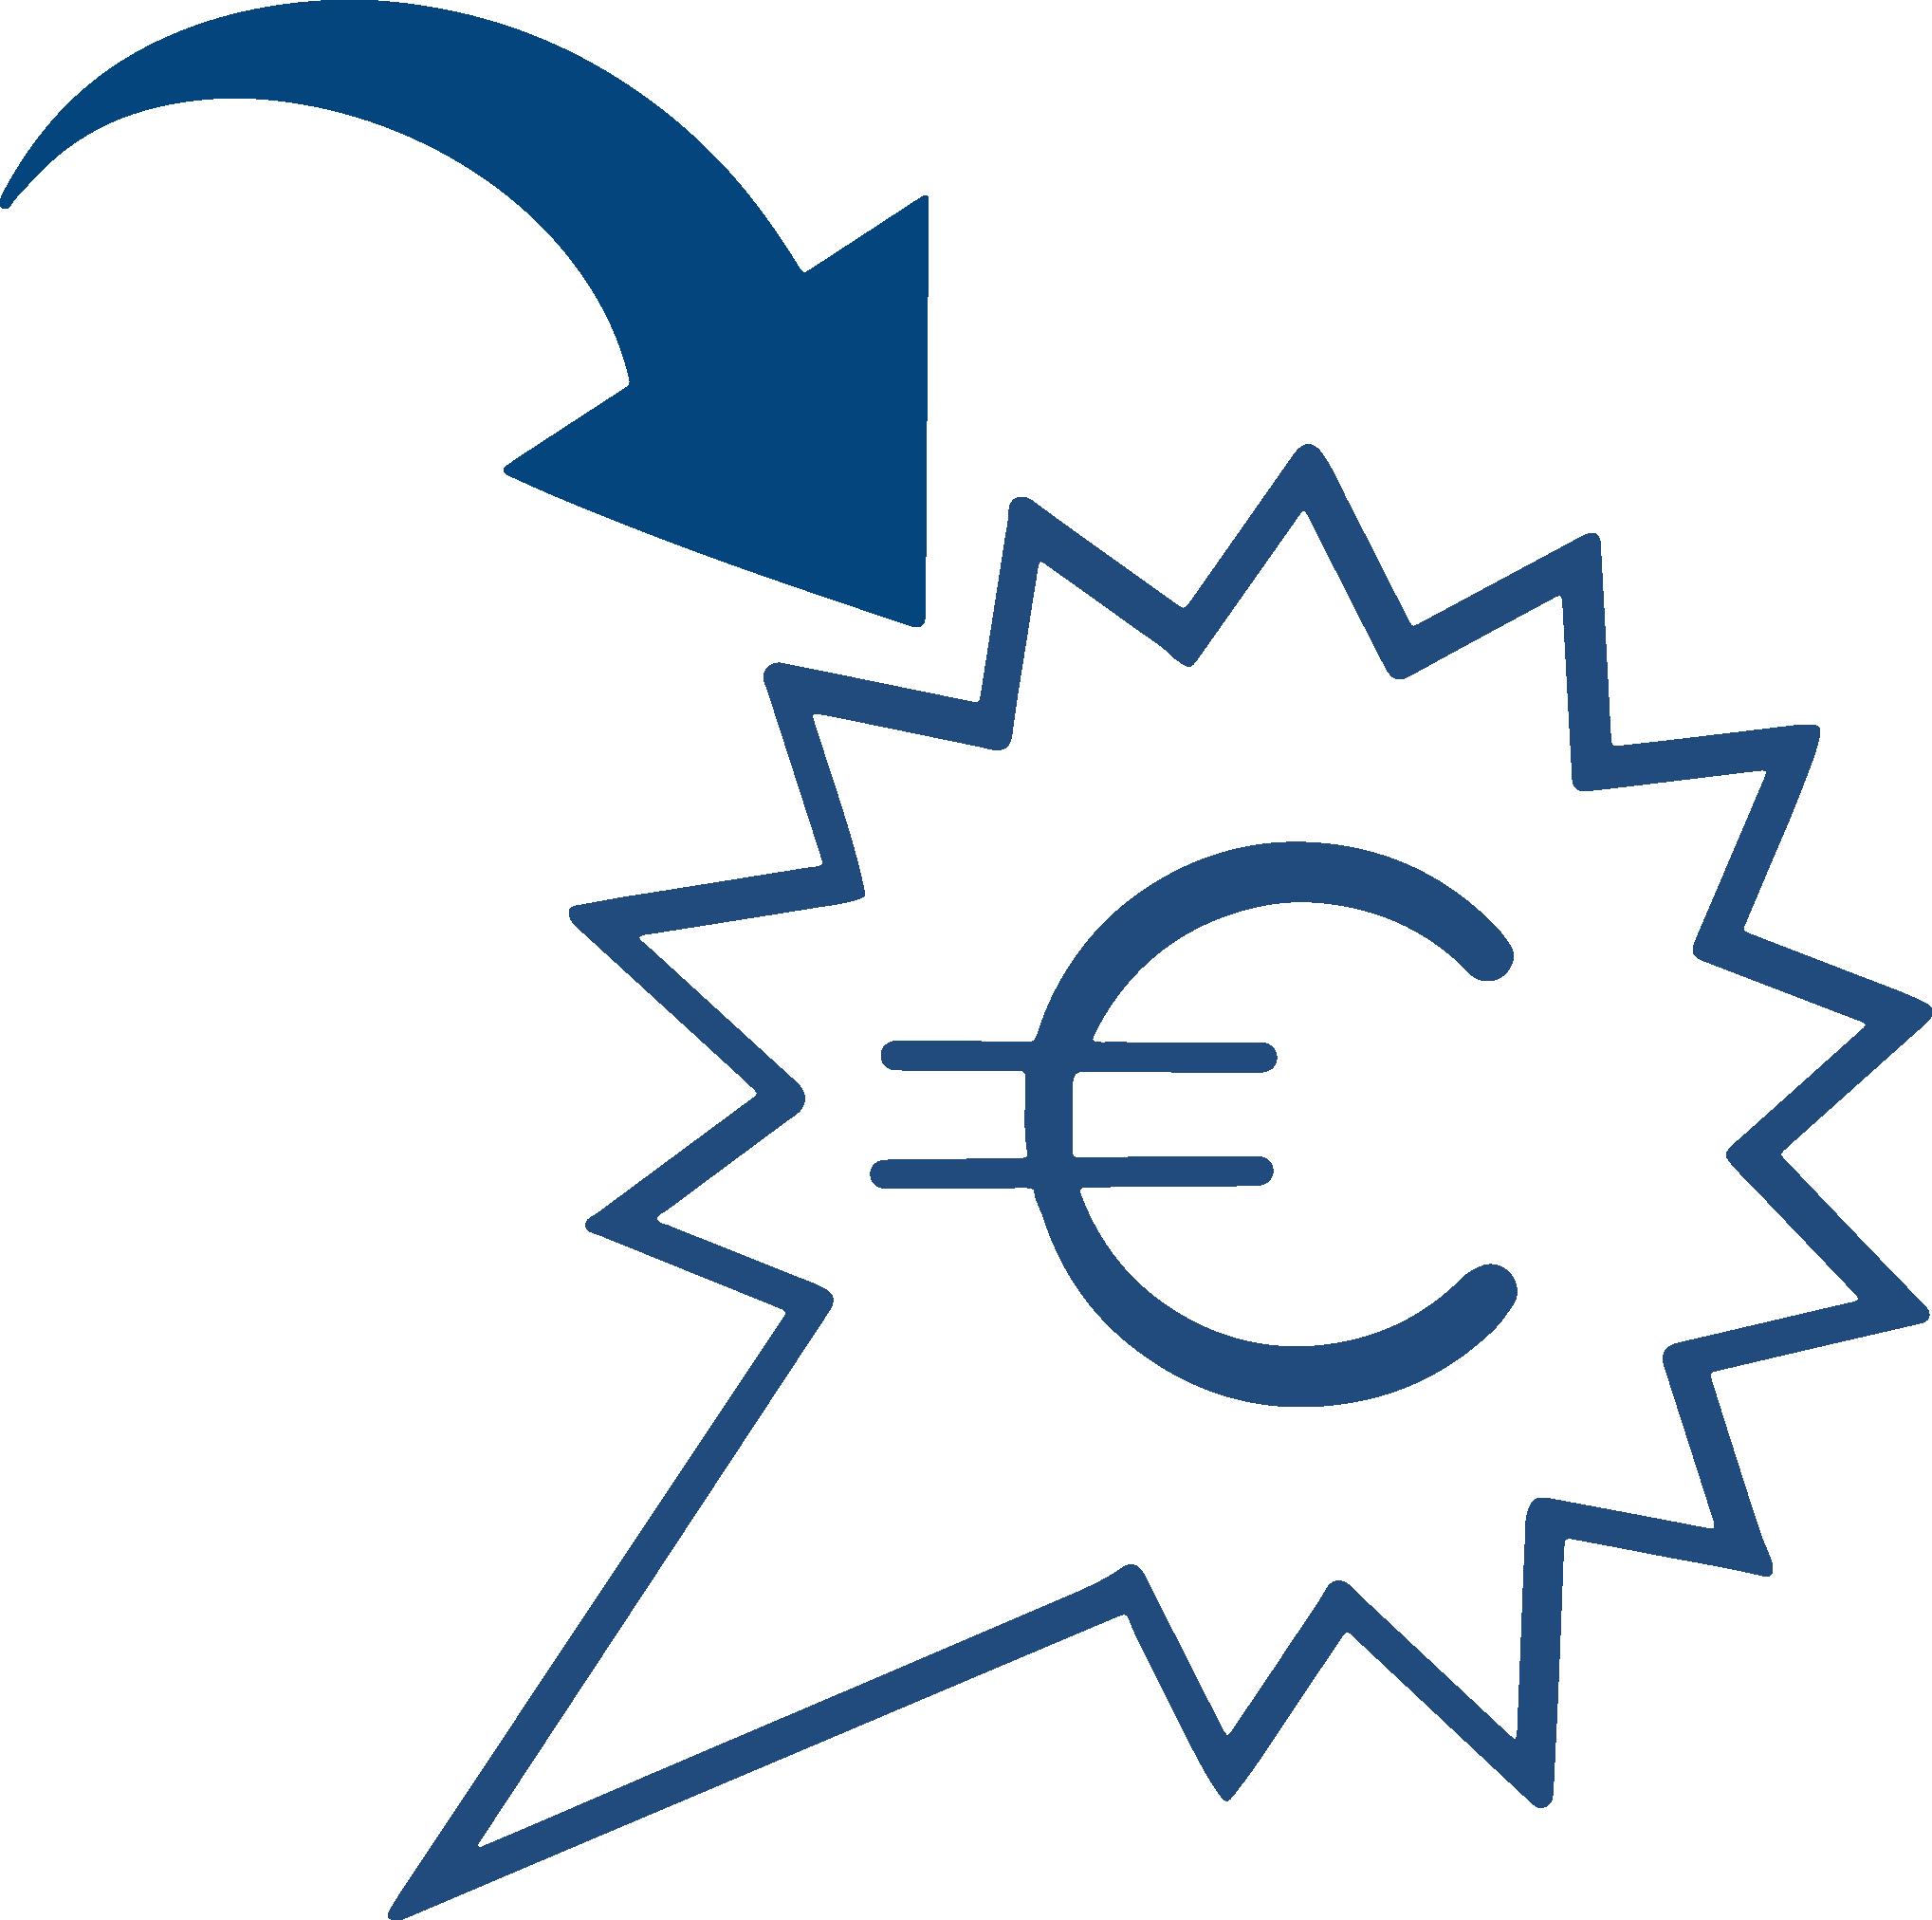 Marketing purpose icon